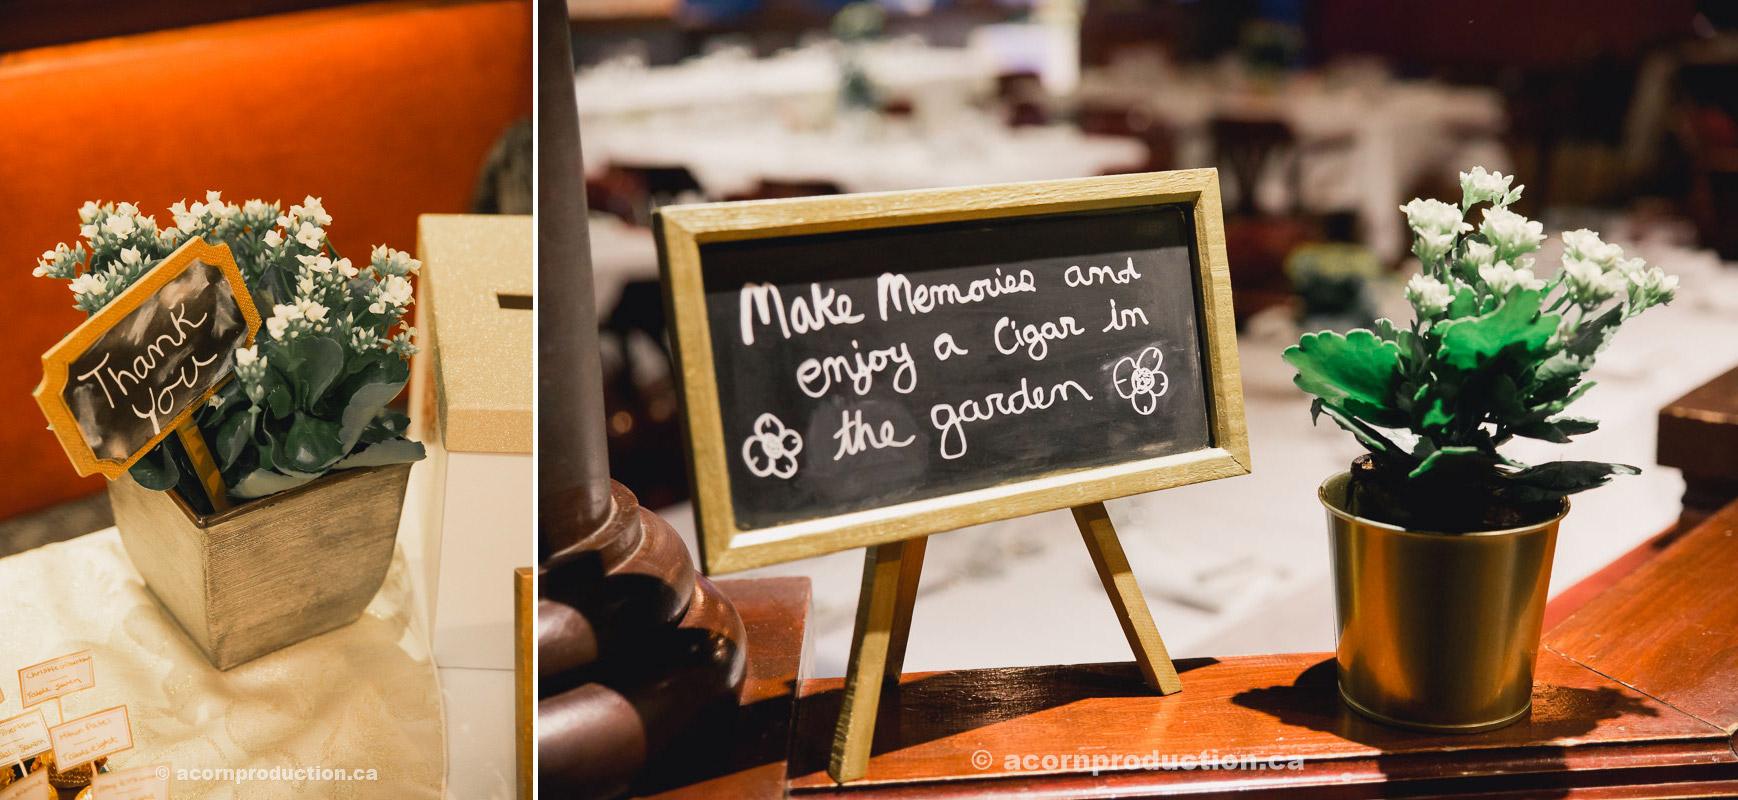 toronto-granite-brewery-wedding-photography-by-acornproduction.ca-18.jpg